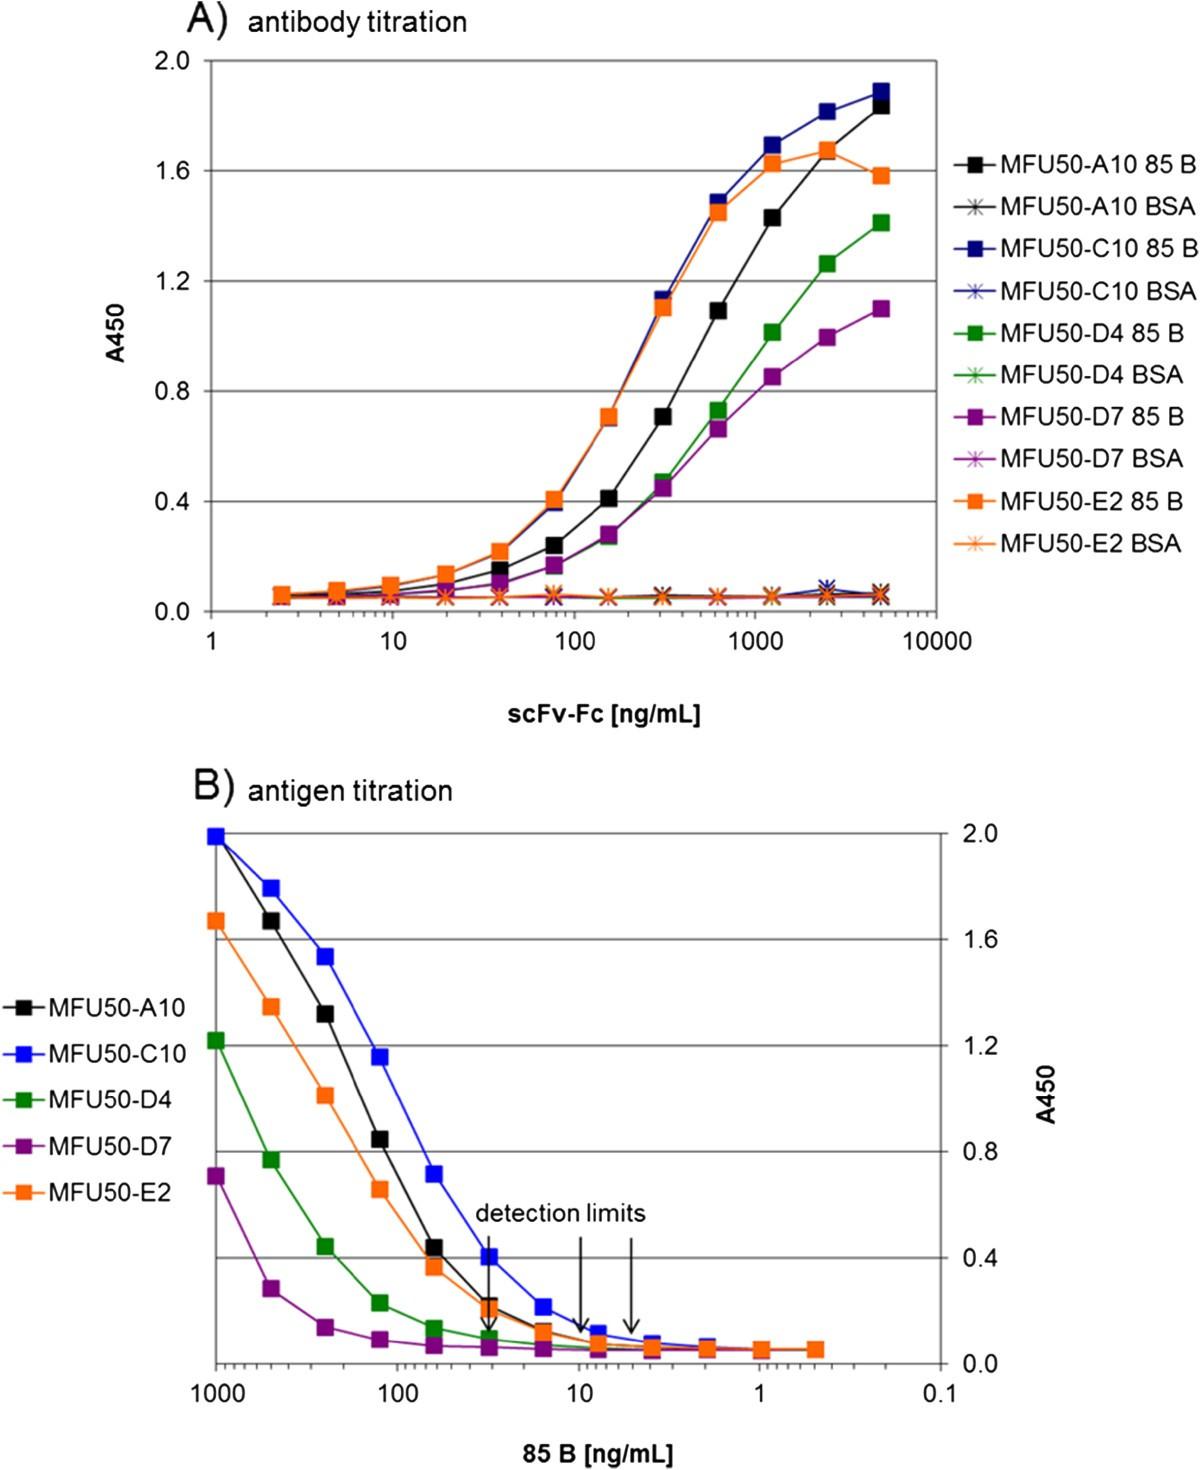 Novel Human Recombinant Antibodies Against Mycobacterium